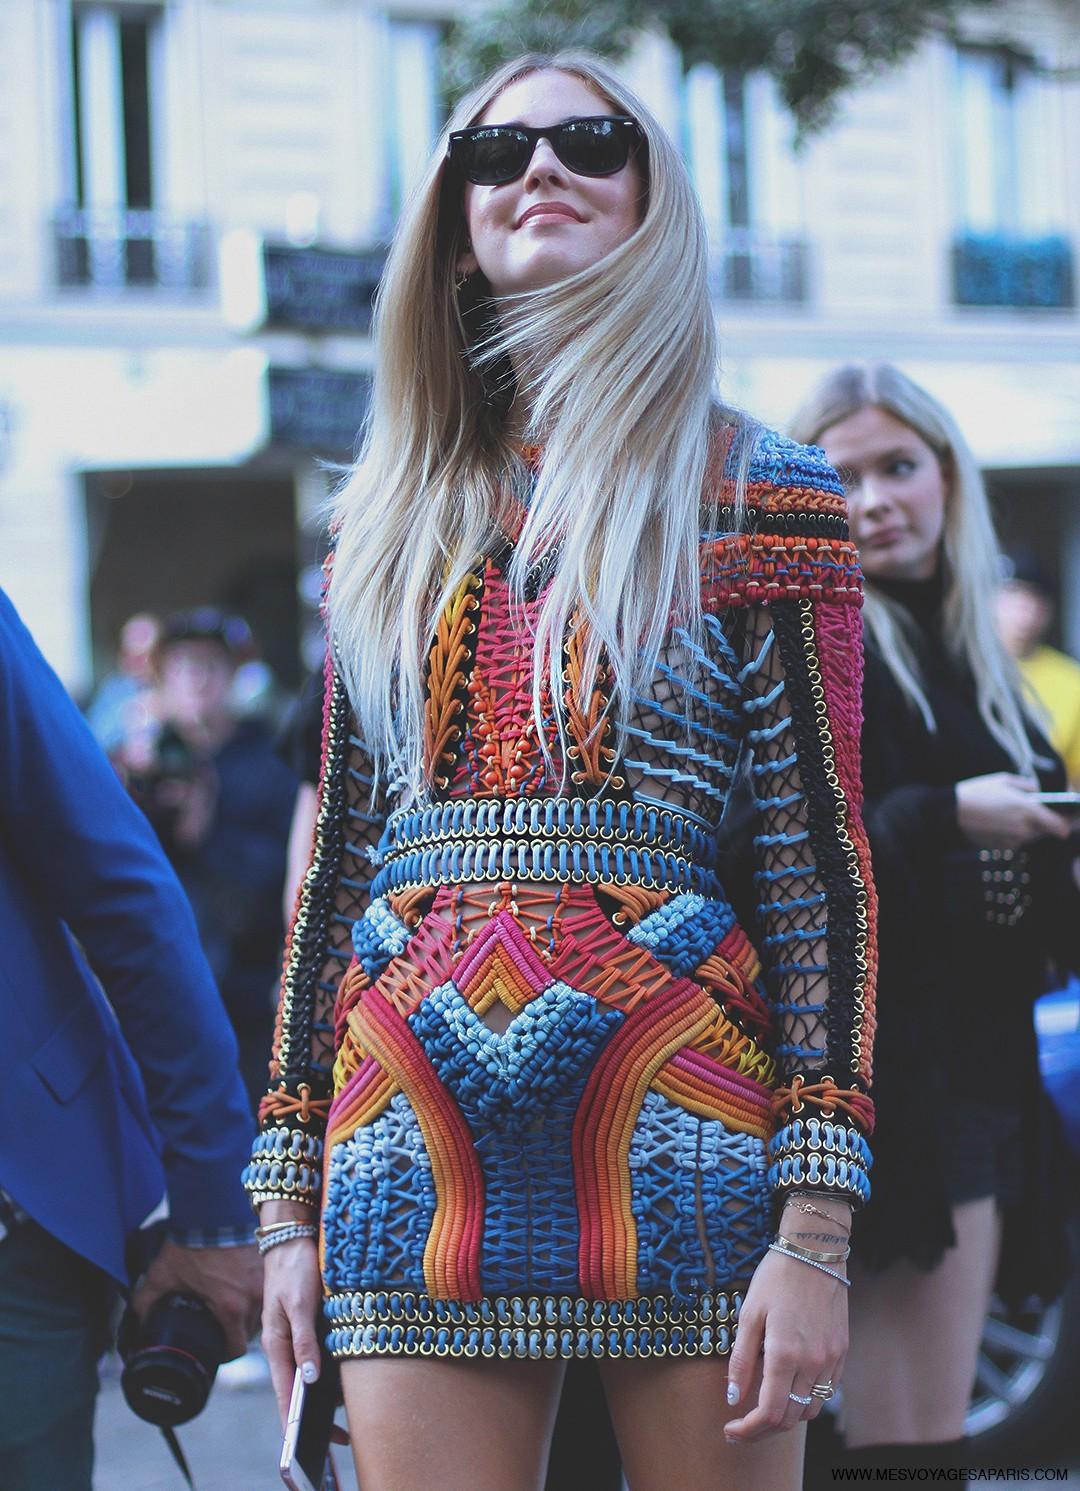 chiara-ferragni-paris-fashion-week-september-2016